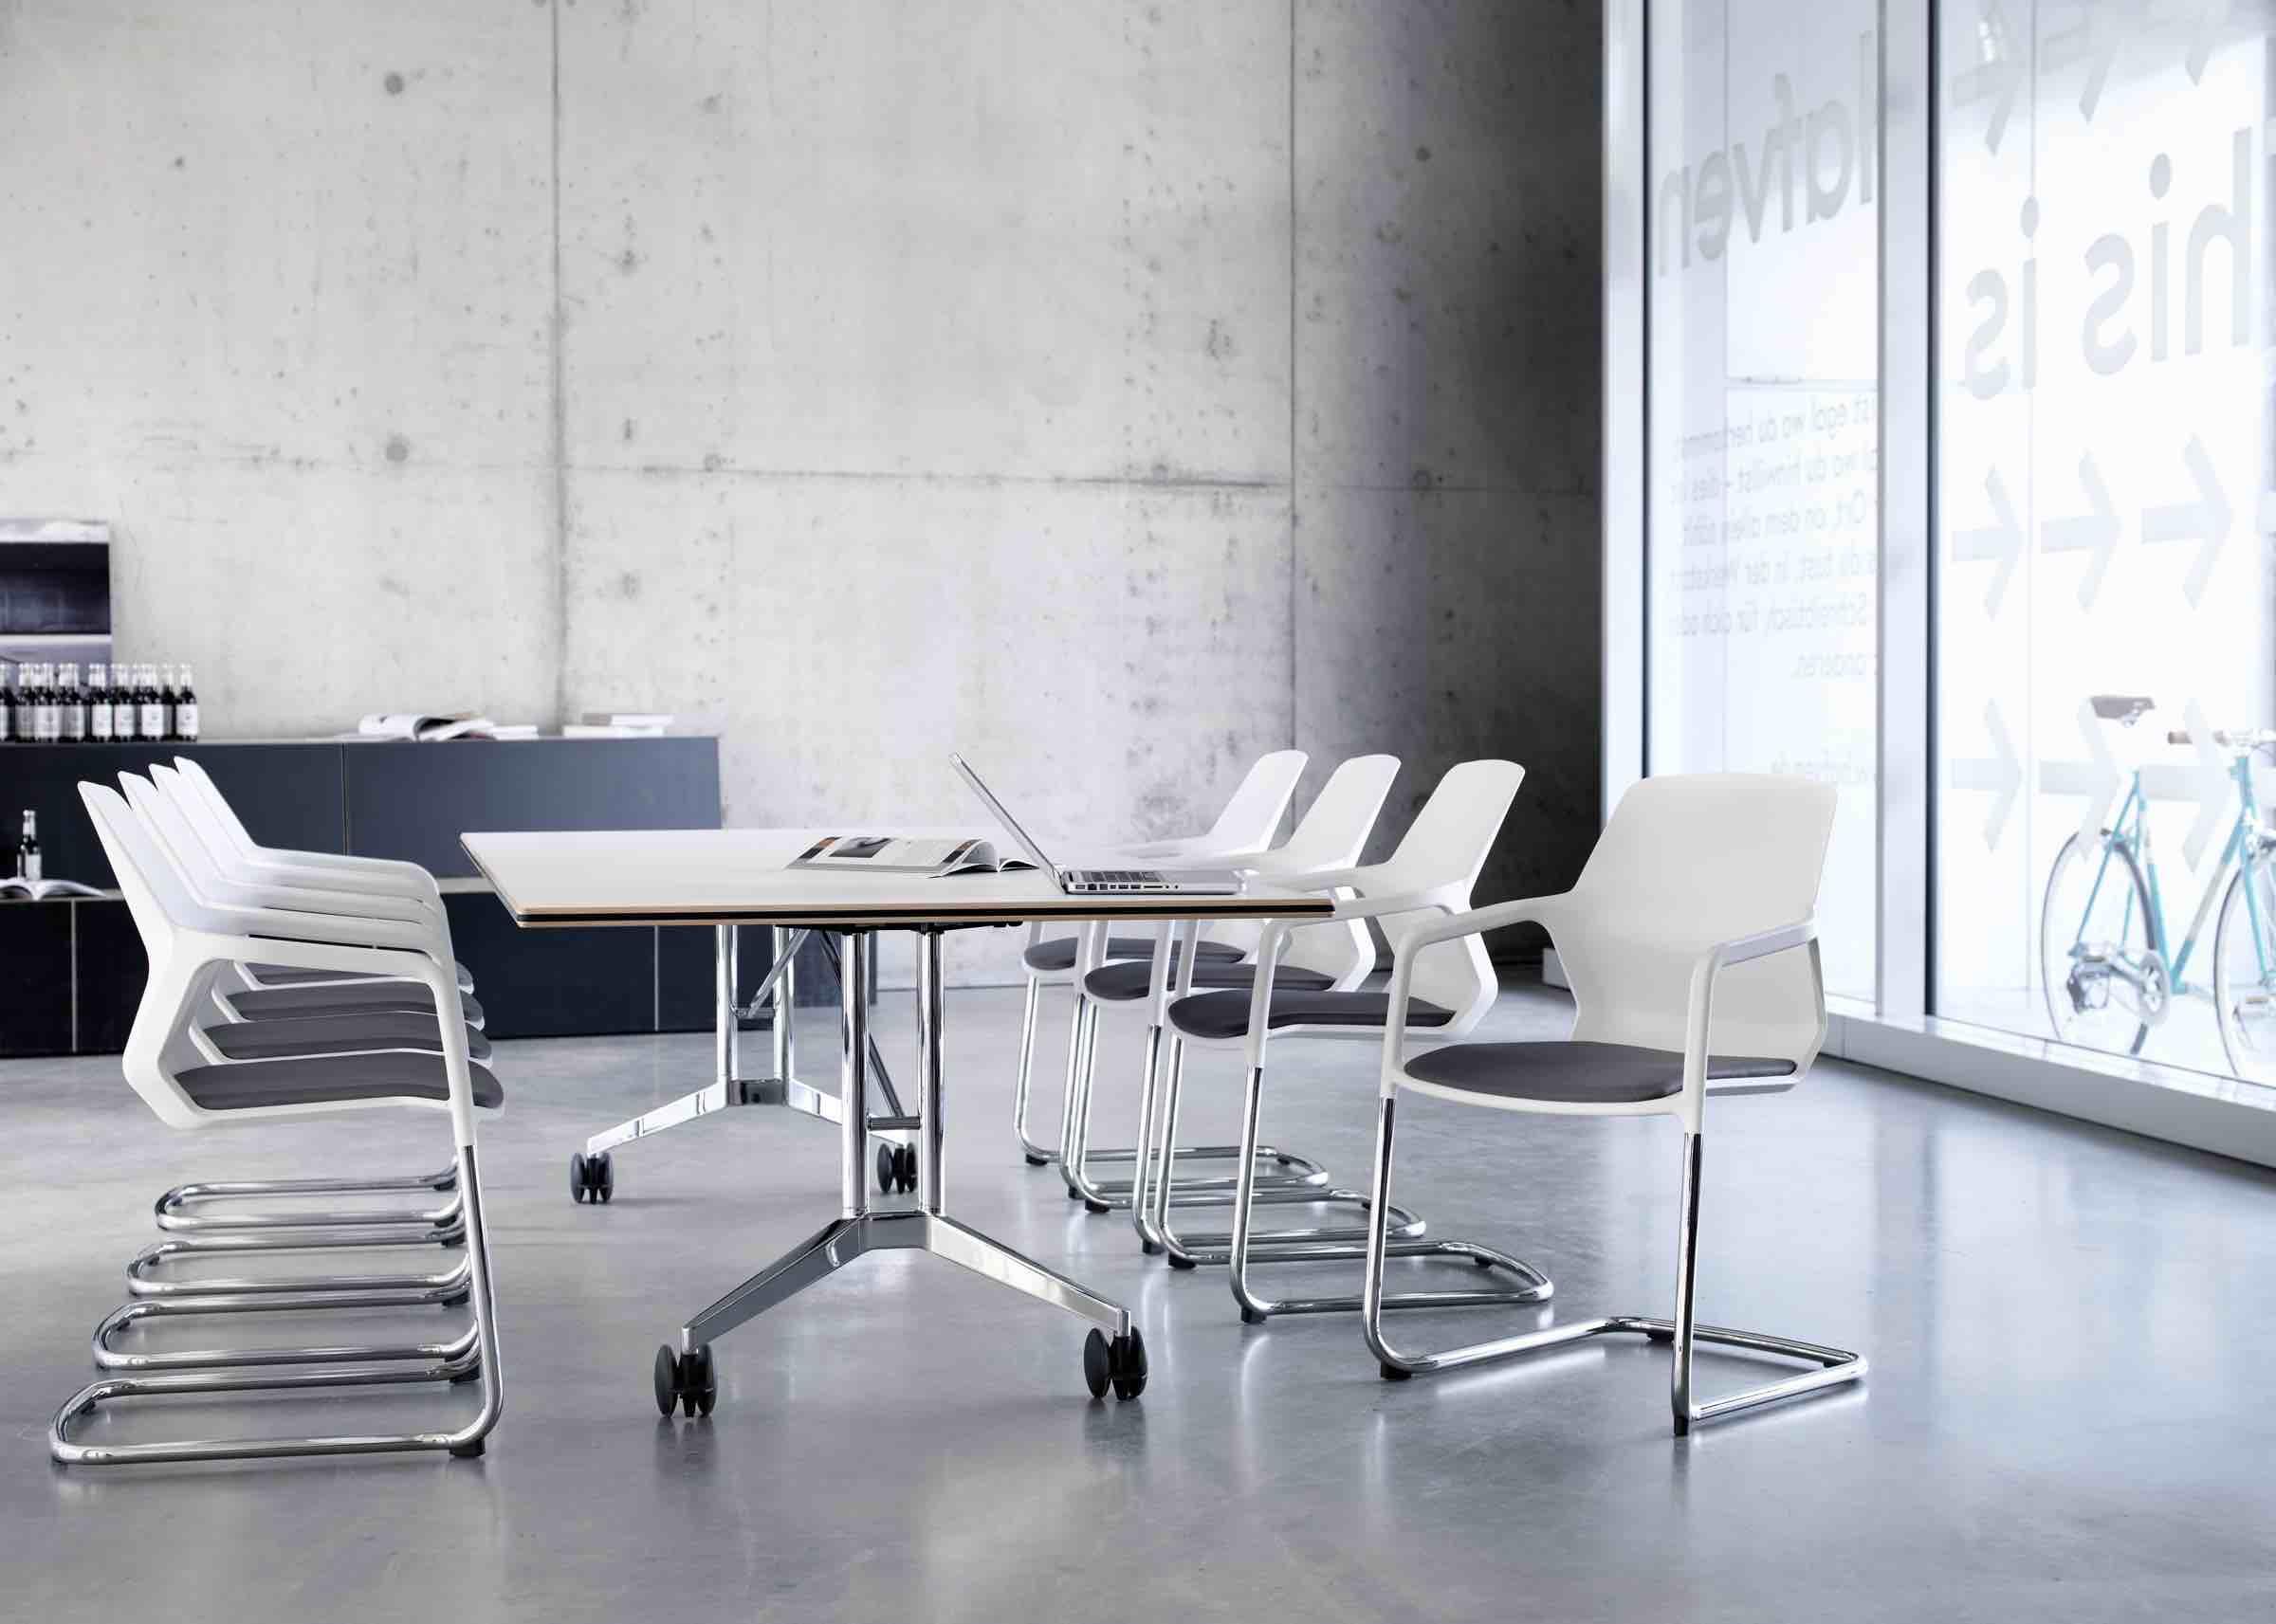 wilkhahn metric design studio. Black Bedroom Furniture Sets. Home Design Ideas